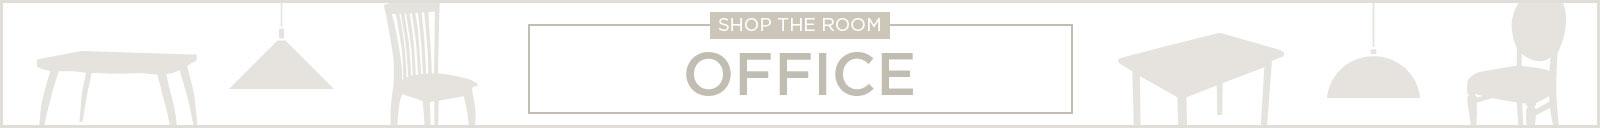 Shop Office Ideas